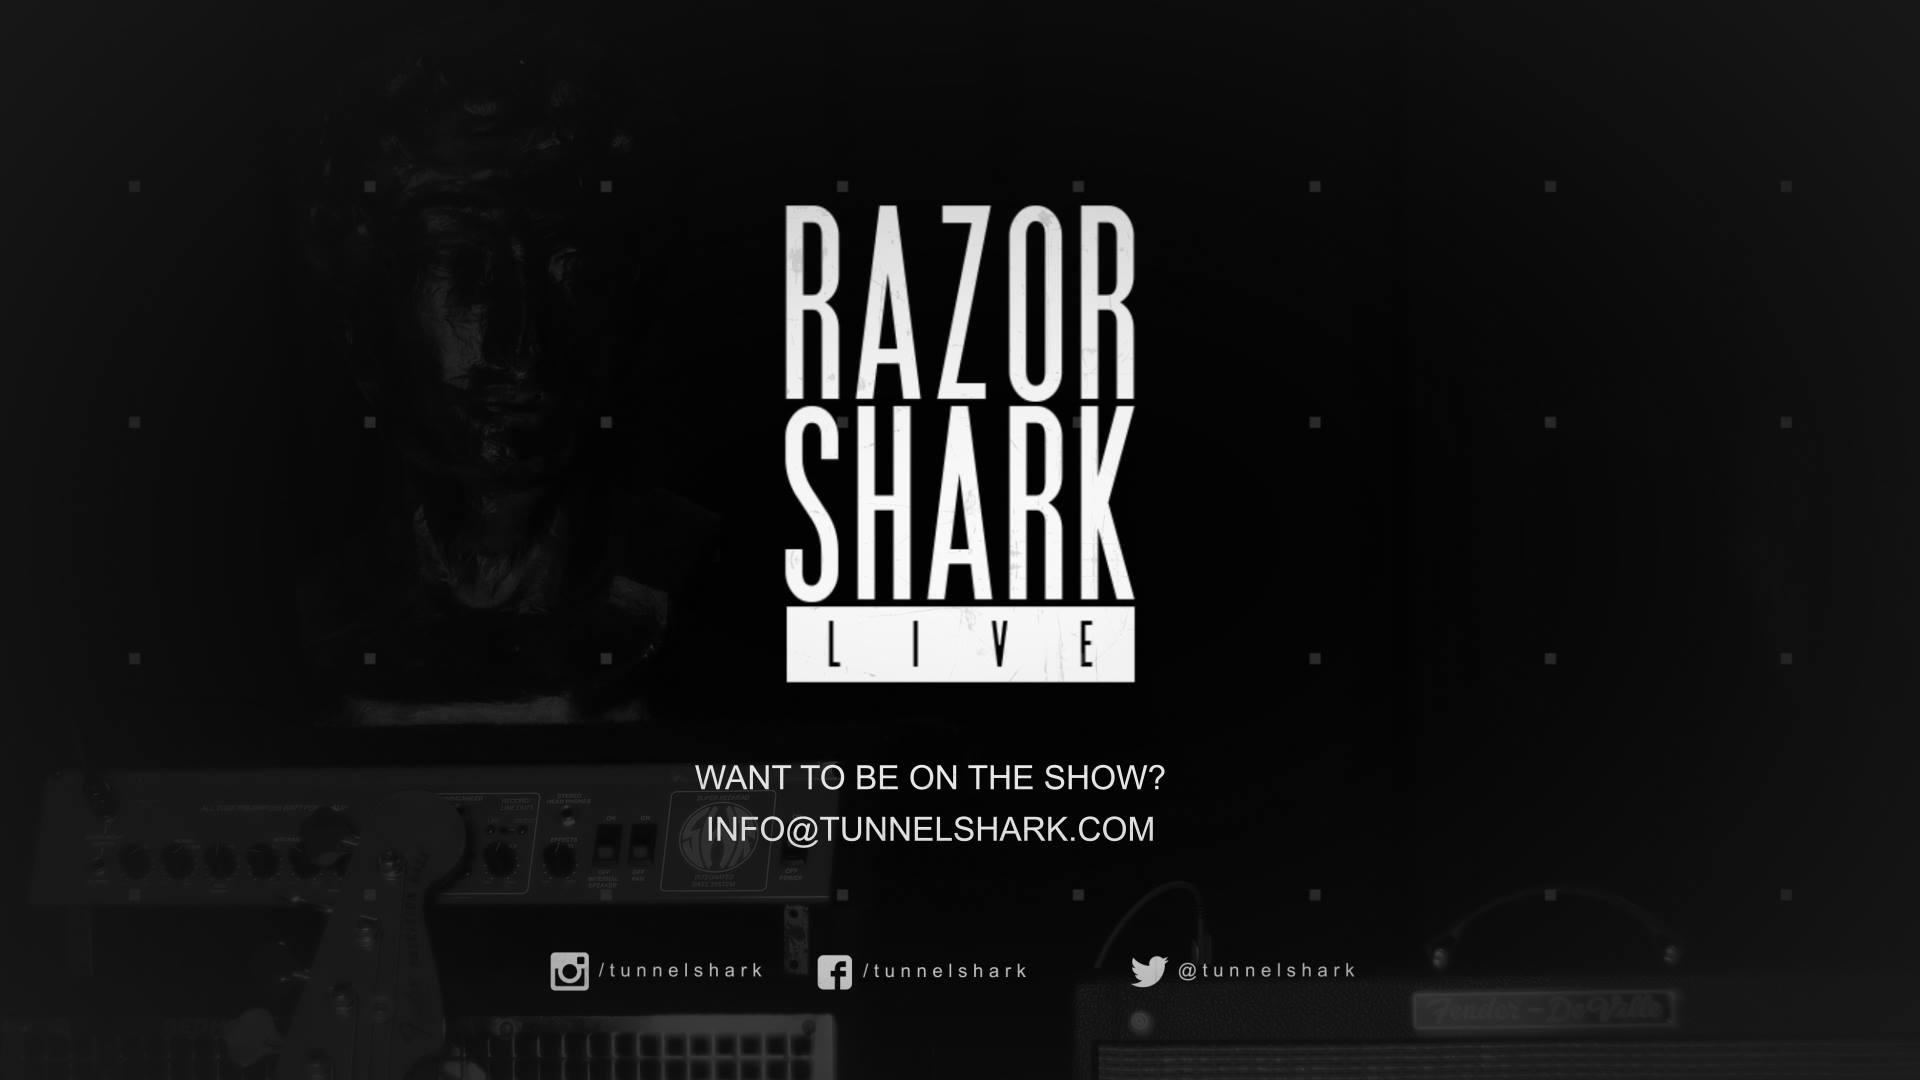 essex musicians, live music video, live music, live music essex, live music southend, tunnel shark productions, razor shark live, straight razor studio